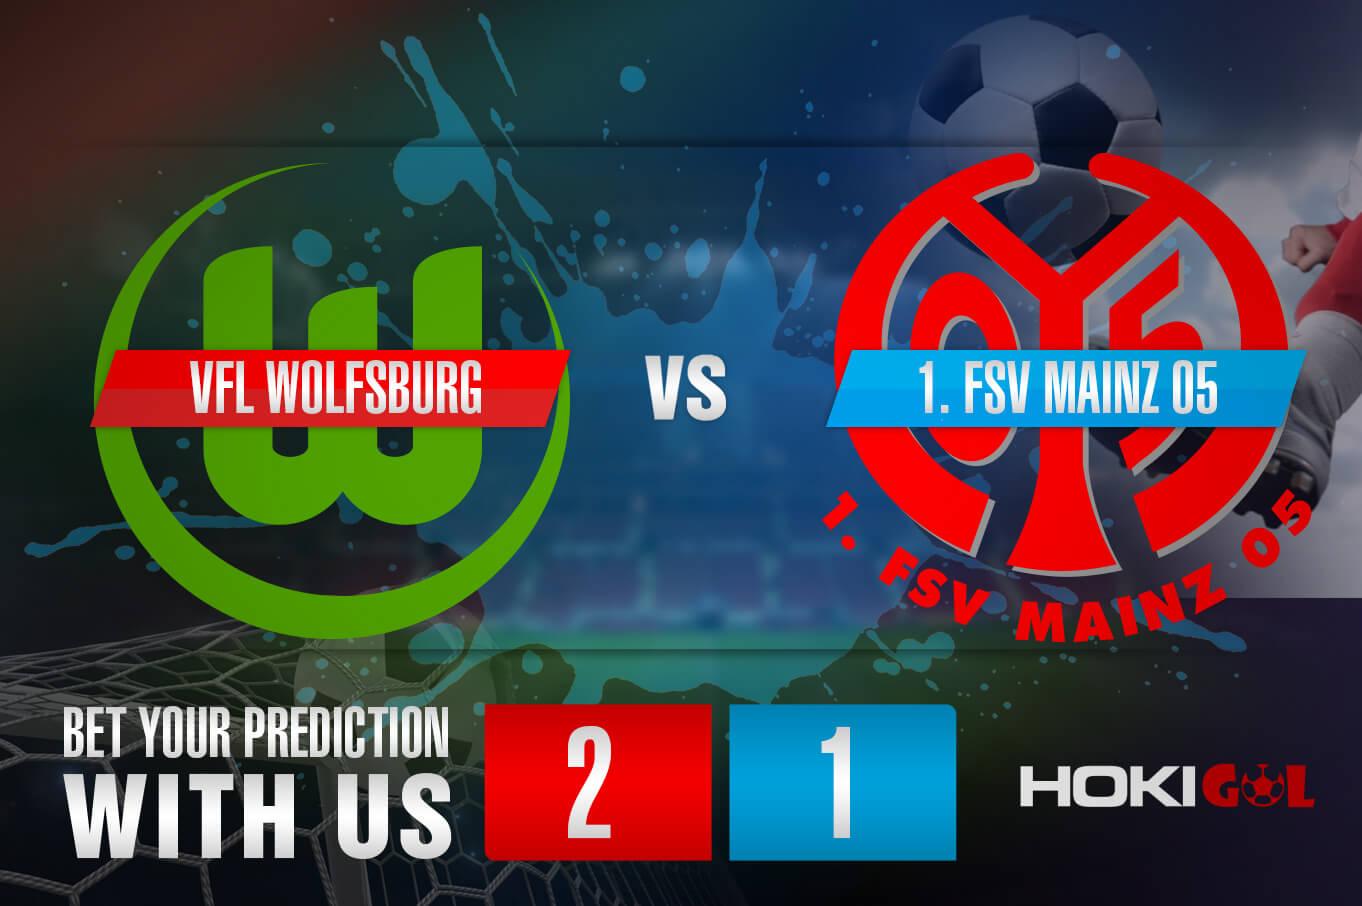 Prediksi Bola VfL Wolfsburg Vs 1. FSV Mainz 05 22 Mei 2021